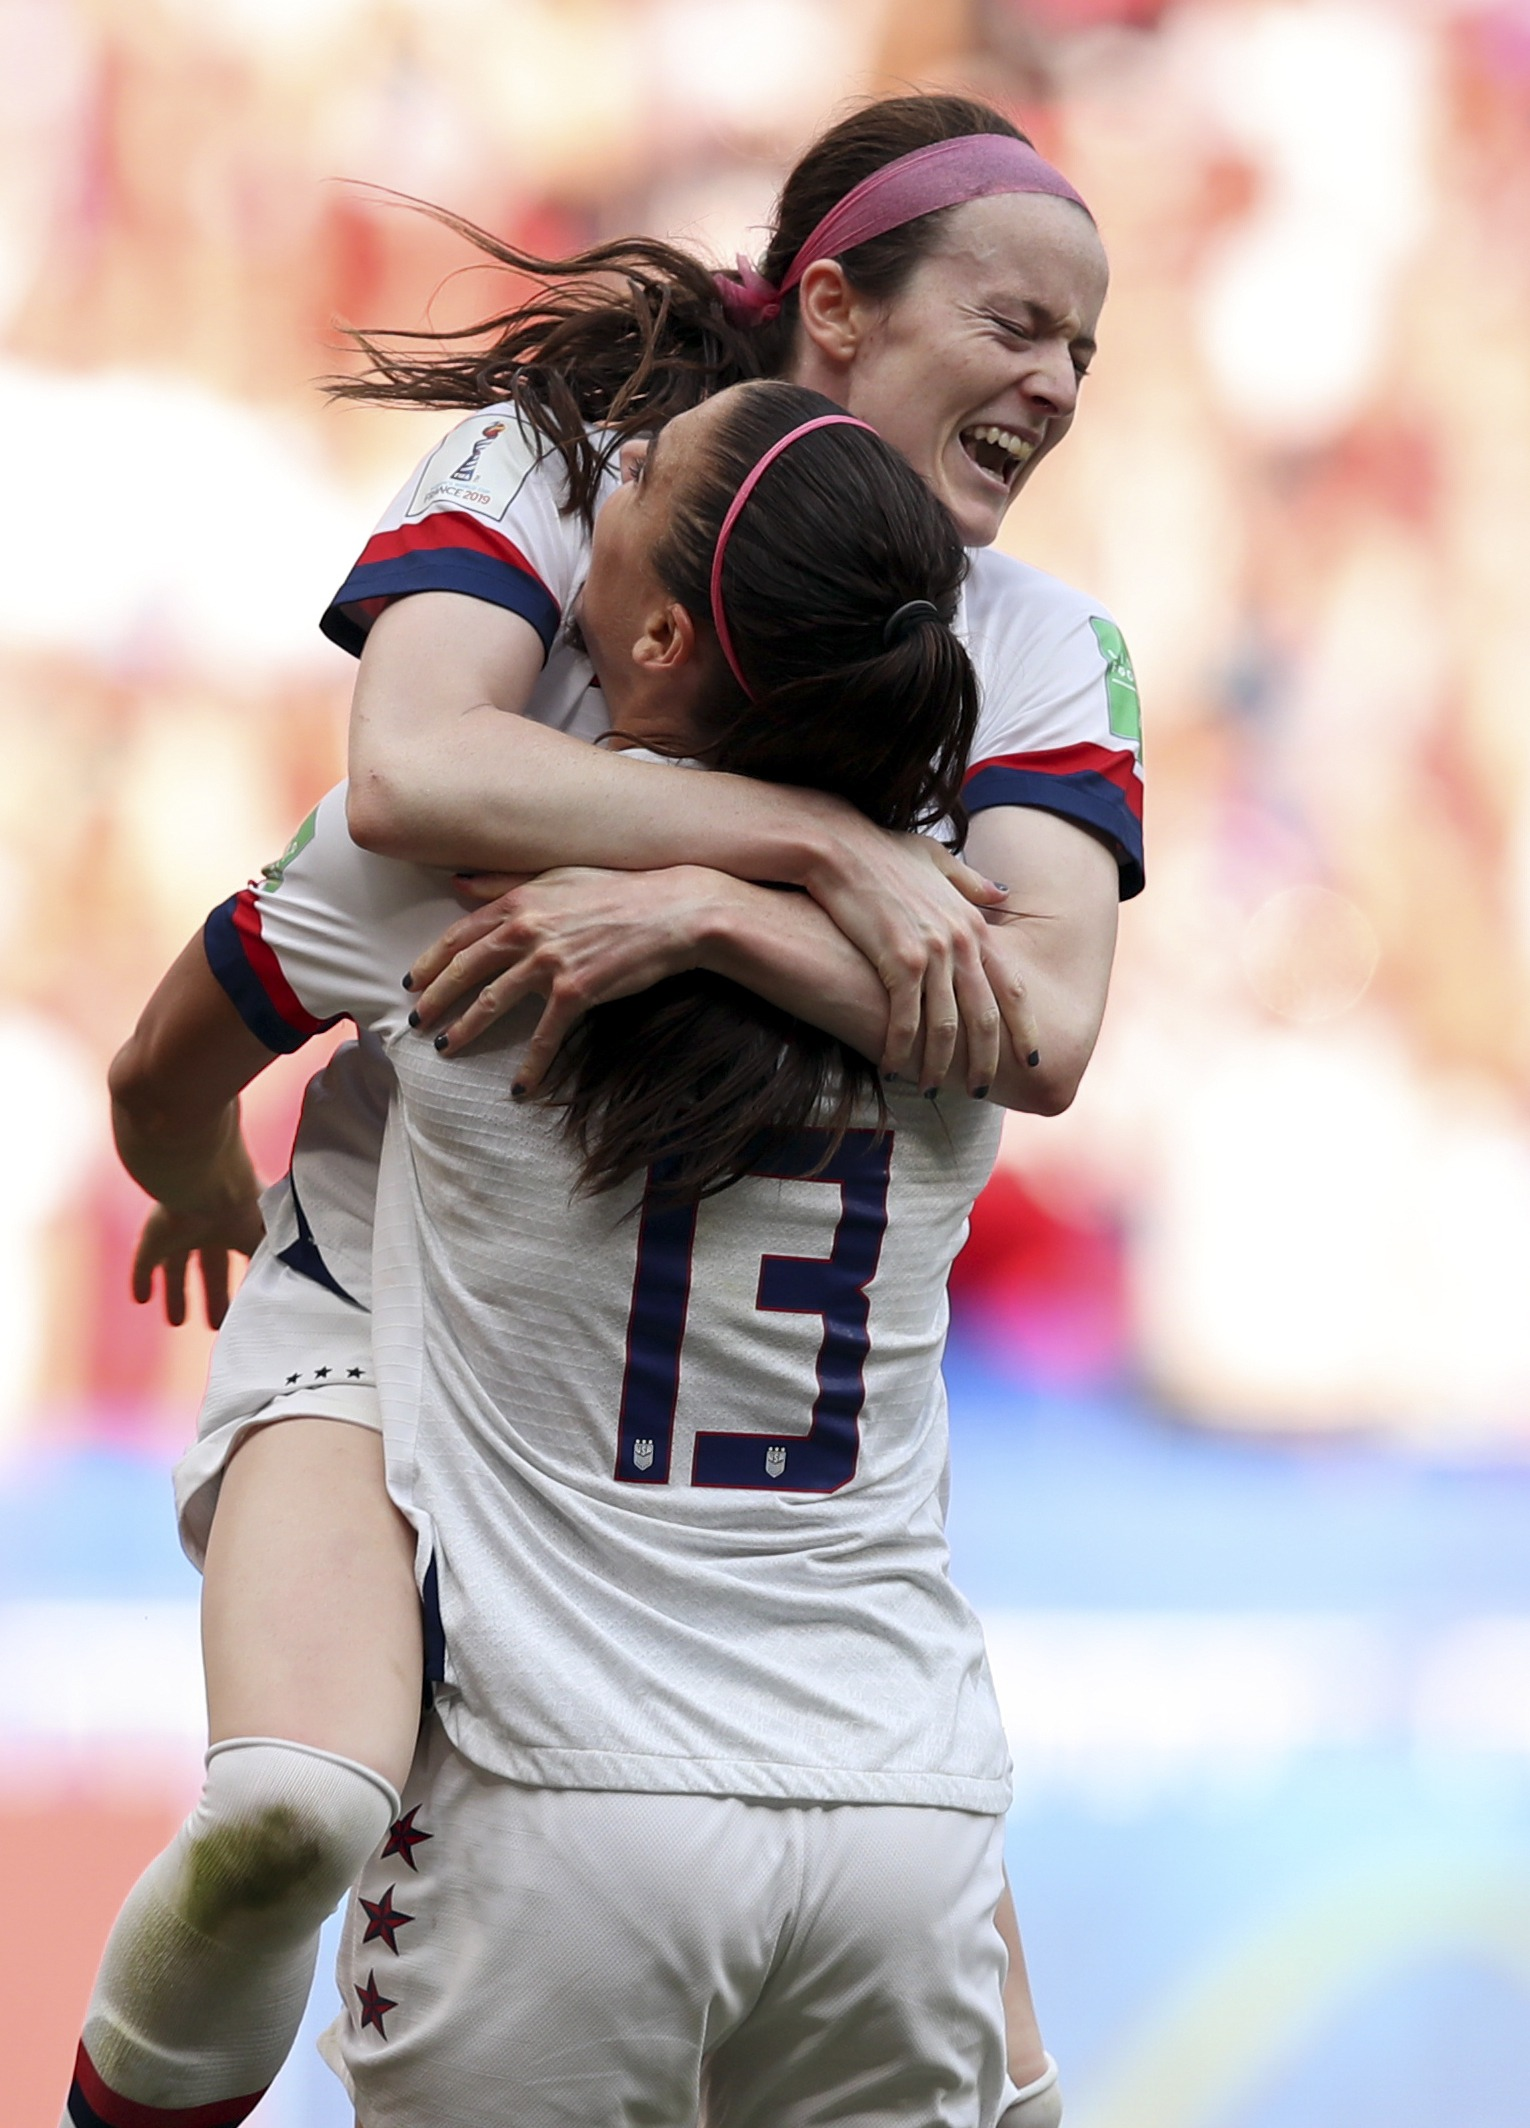 EEUU vence a Holanda 2-0, gana el mundial